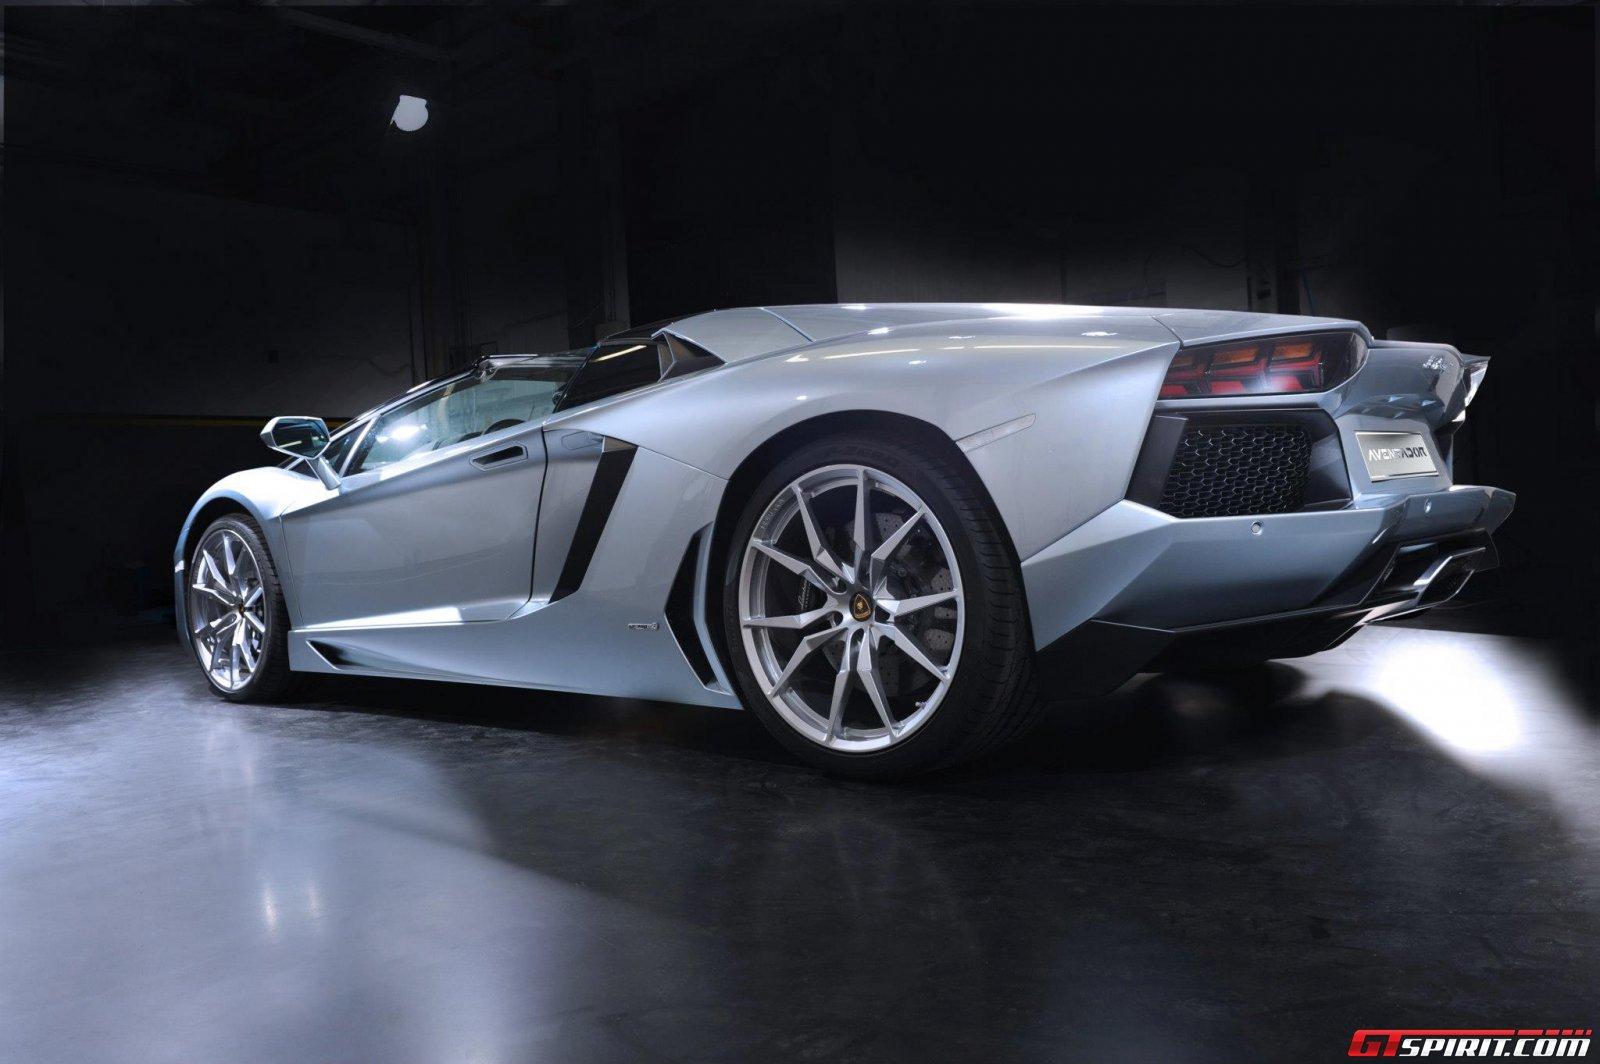 2013 Lamborghini Aventador LP700-4 Roadster Photo 16